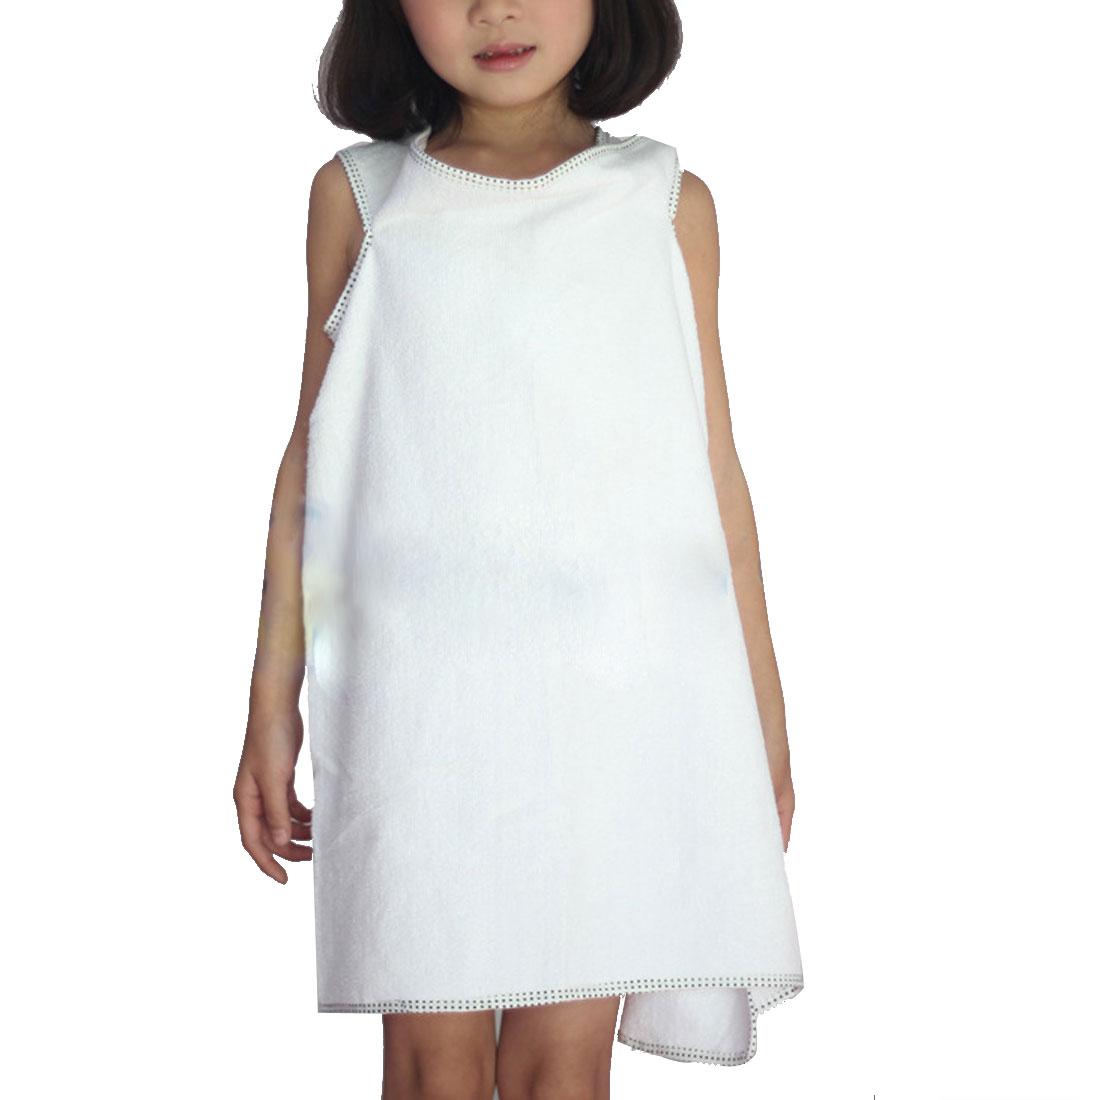 Girl Microfiber Spa Beach Swimming Shower Bath Towel Wrap Skirt Washcloth White